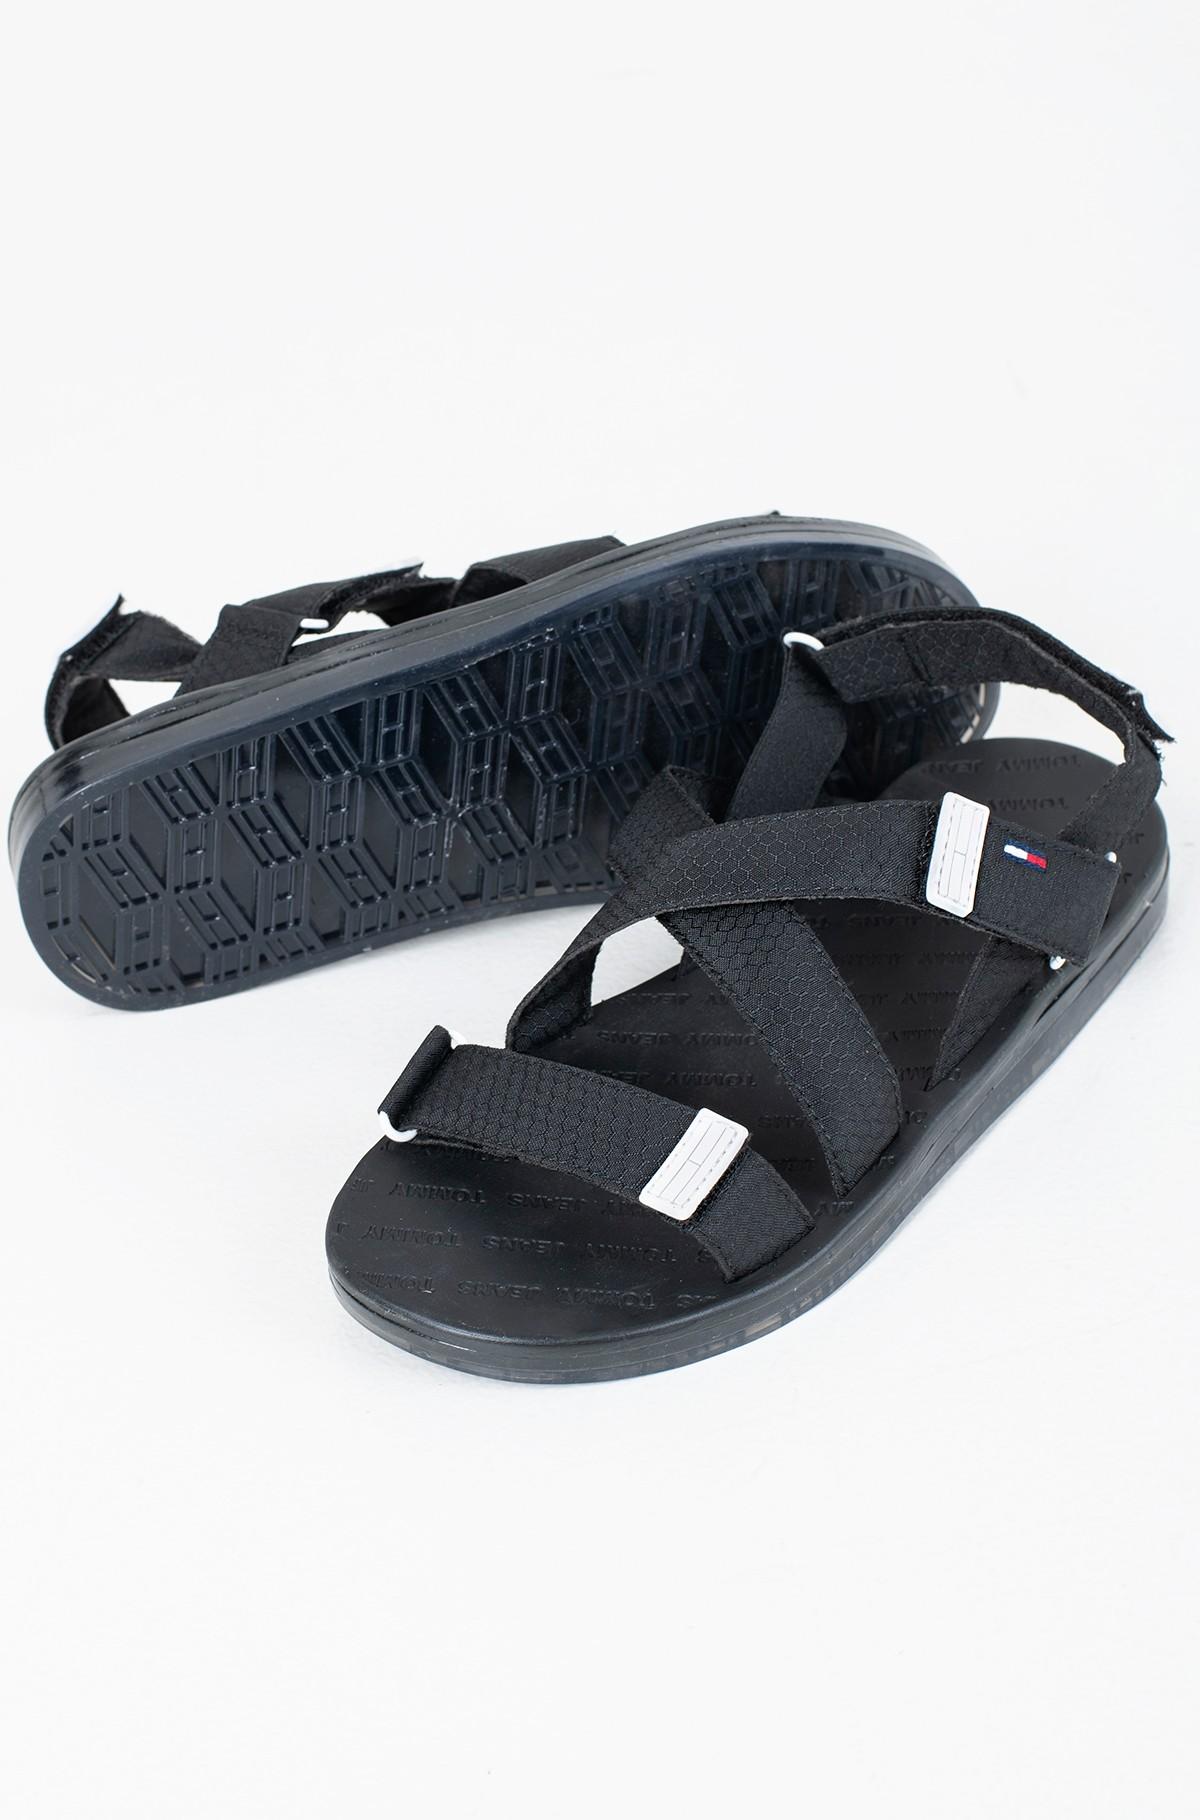 Sandales TOMMY SURPLUS FLAT SANDAL-full-1